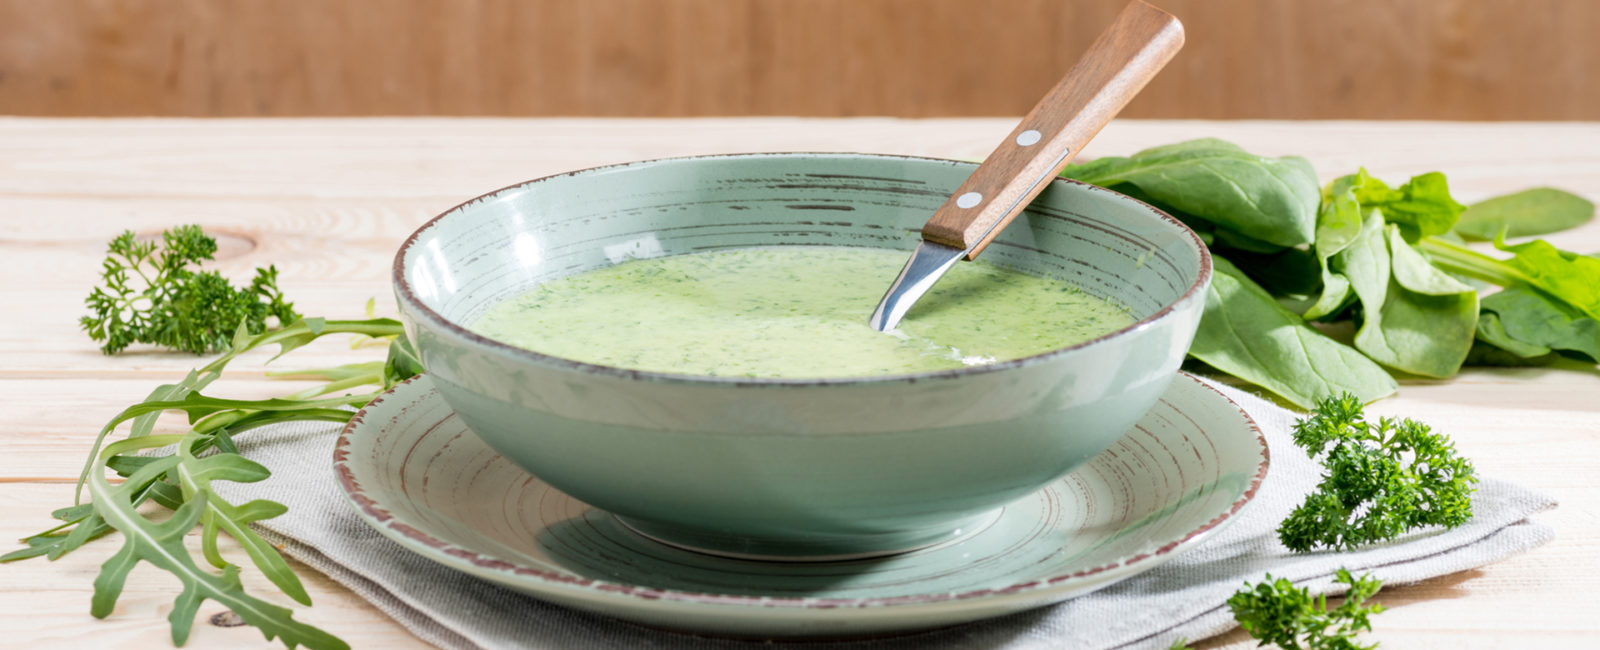 Den Körper Entgiften - Foto Detox-Suppe